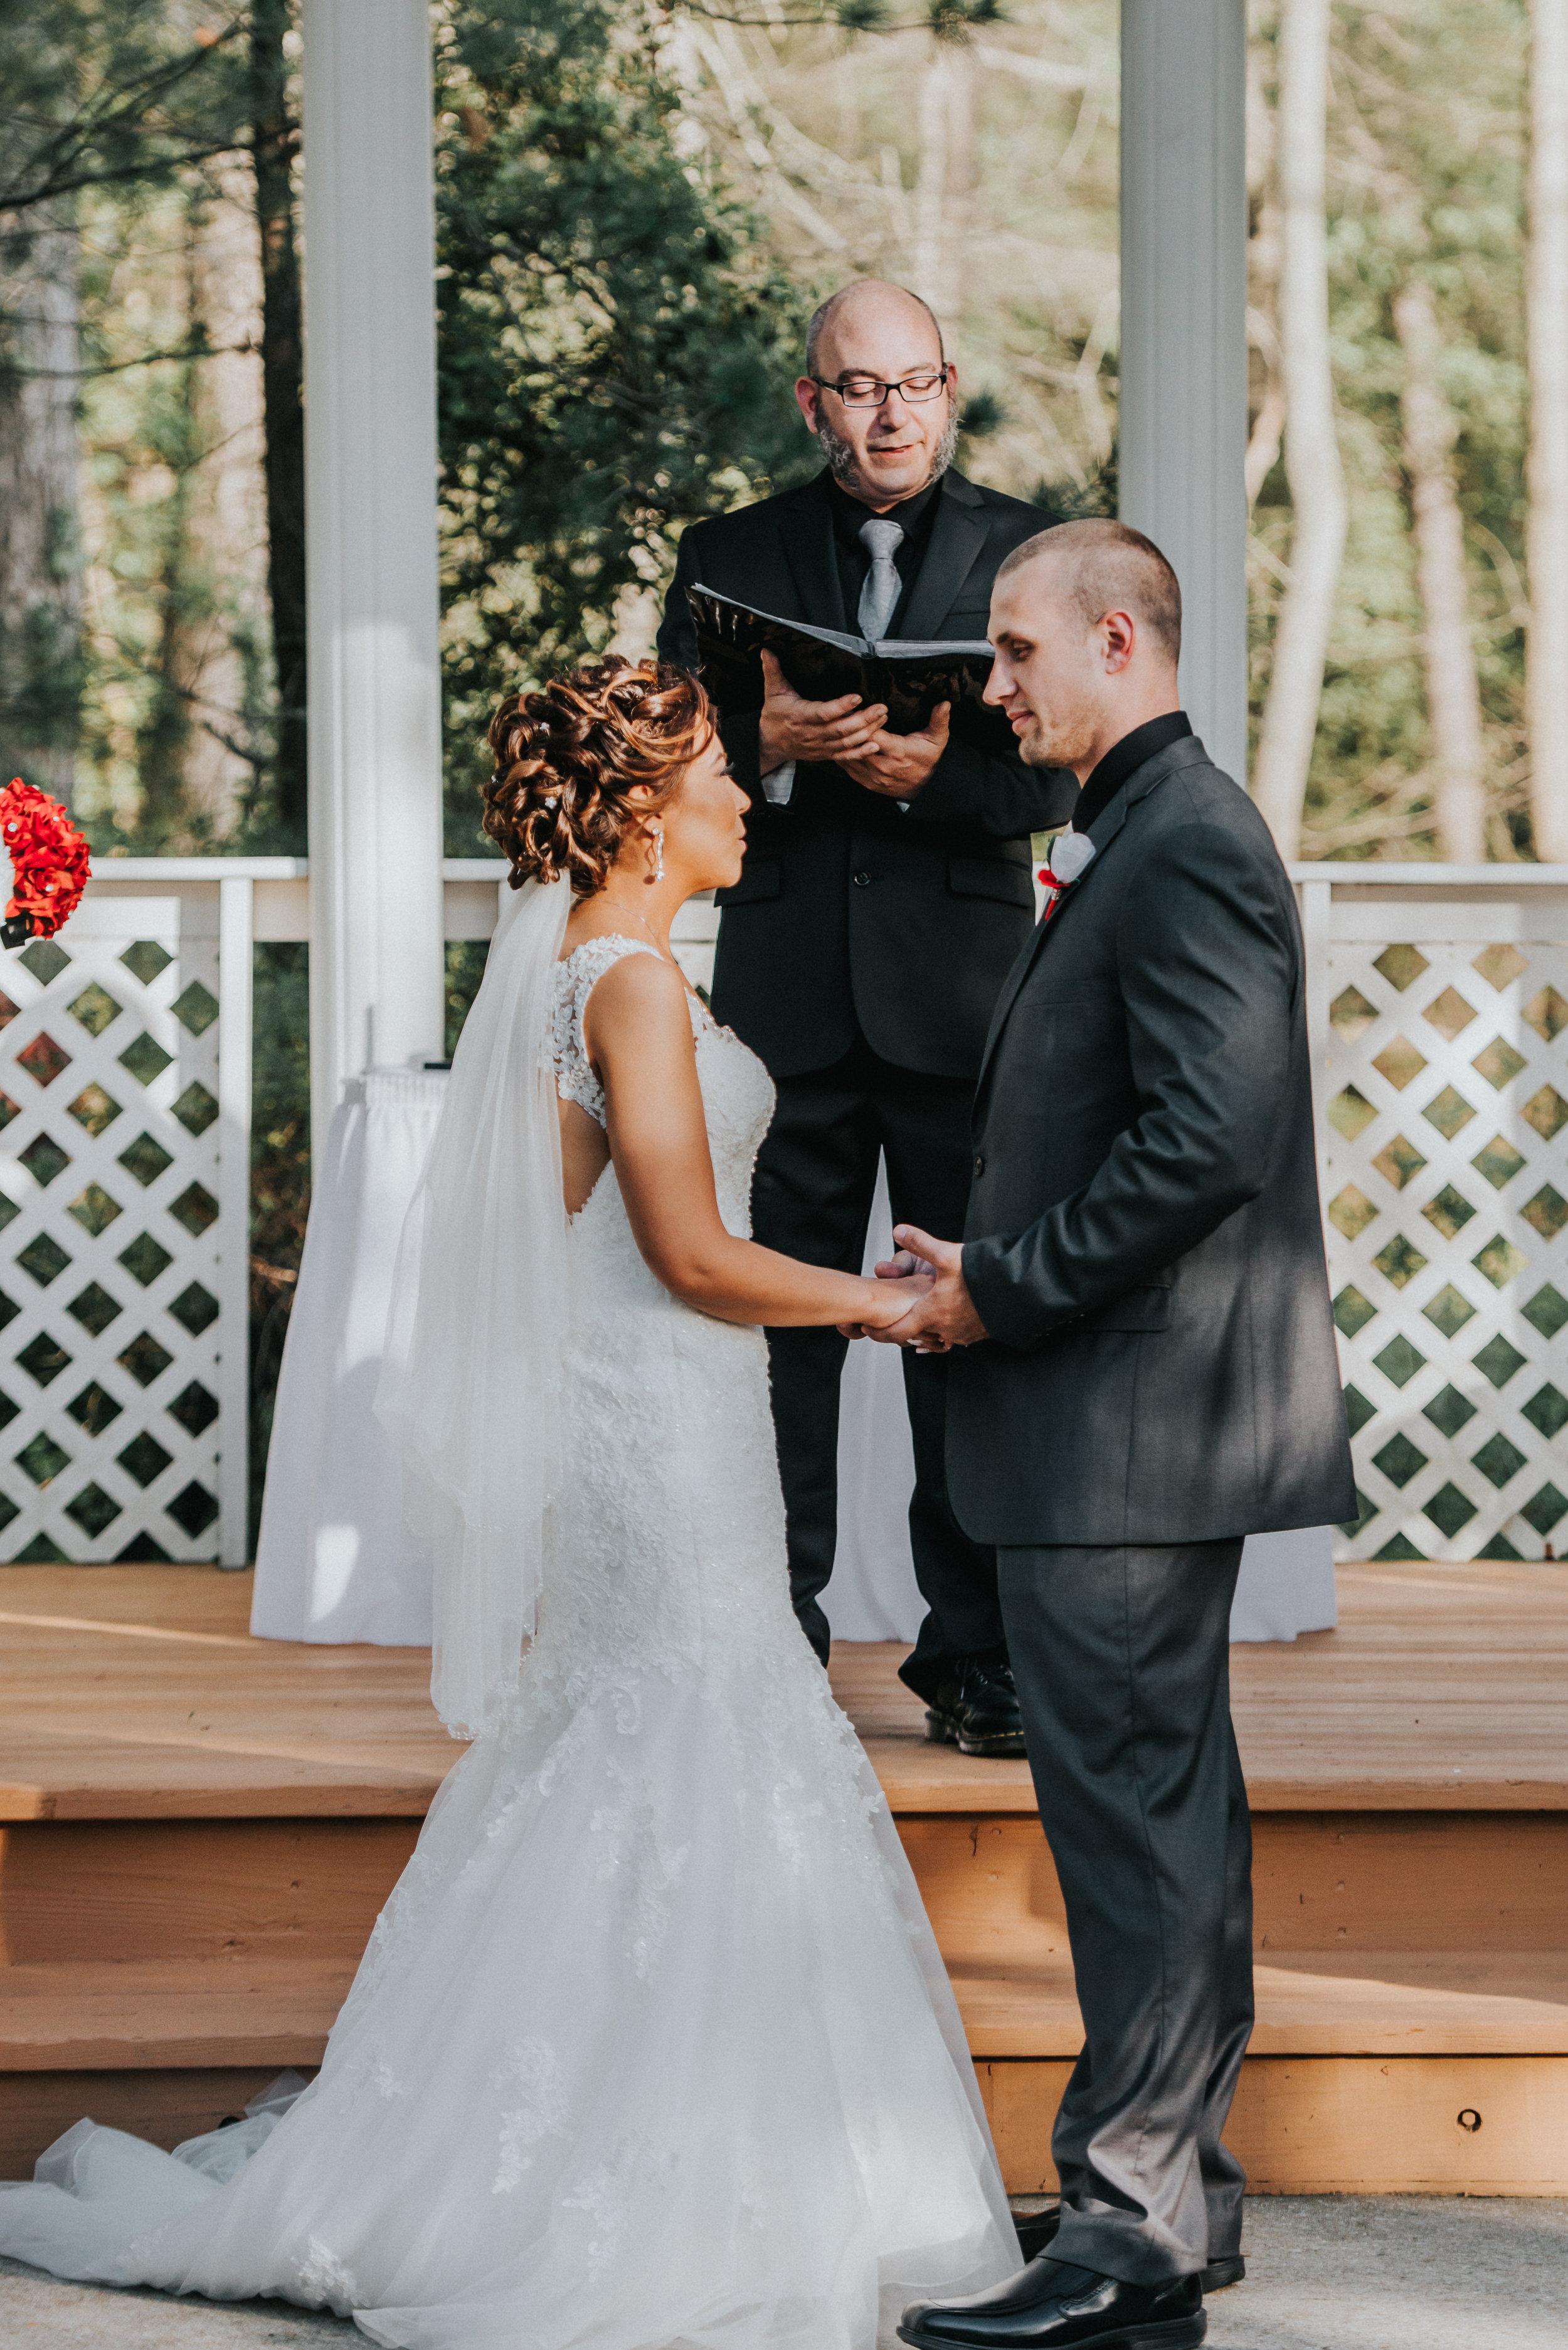 Christina-and-Gene-Wedding-Marla-Rain-Photography-349.jpg